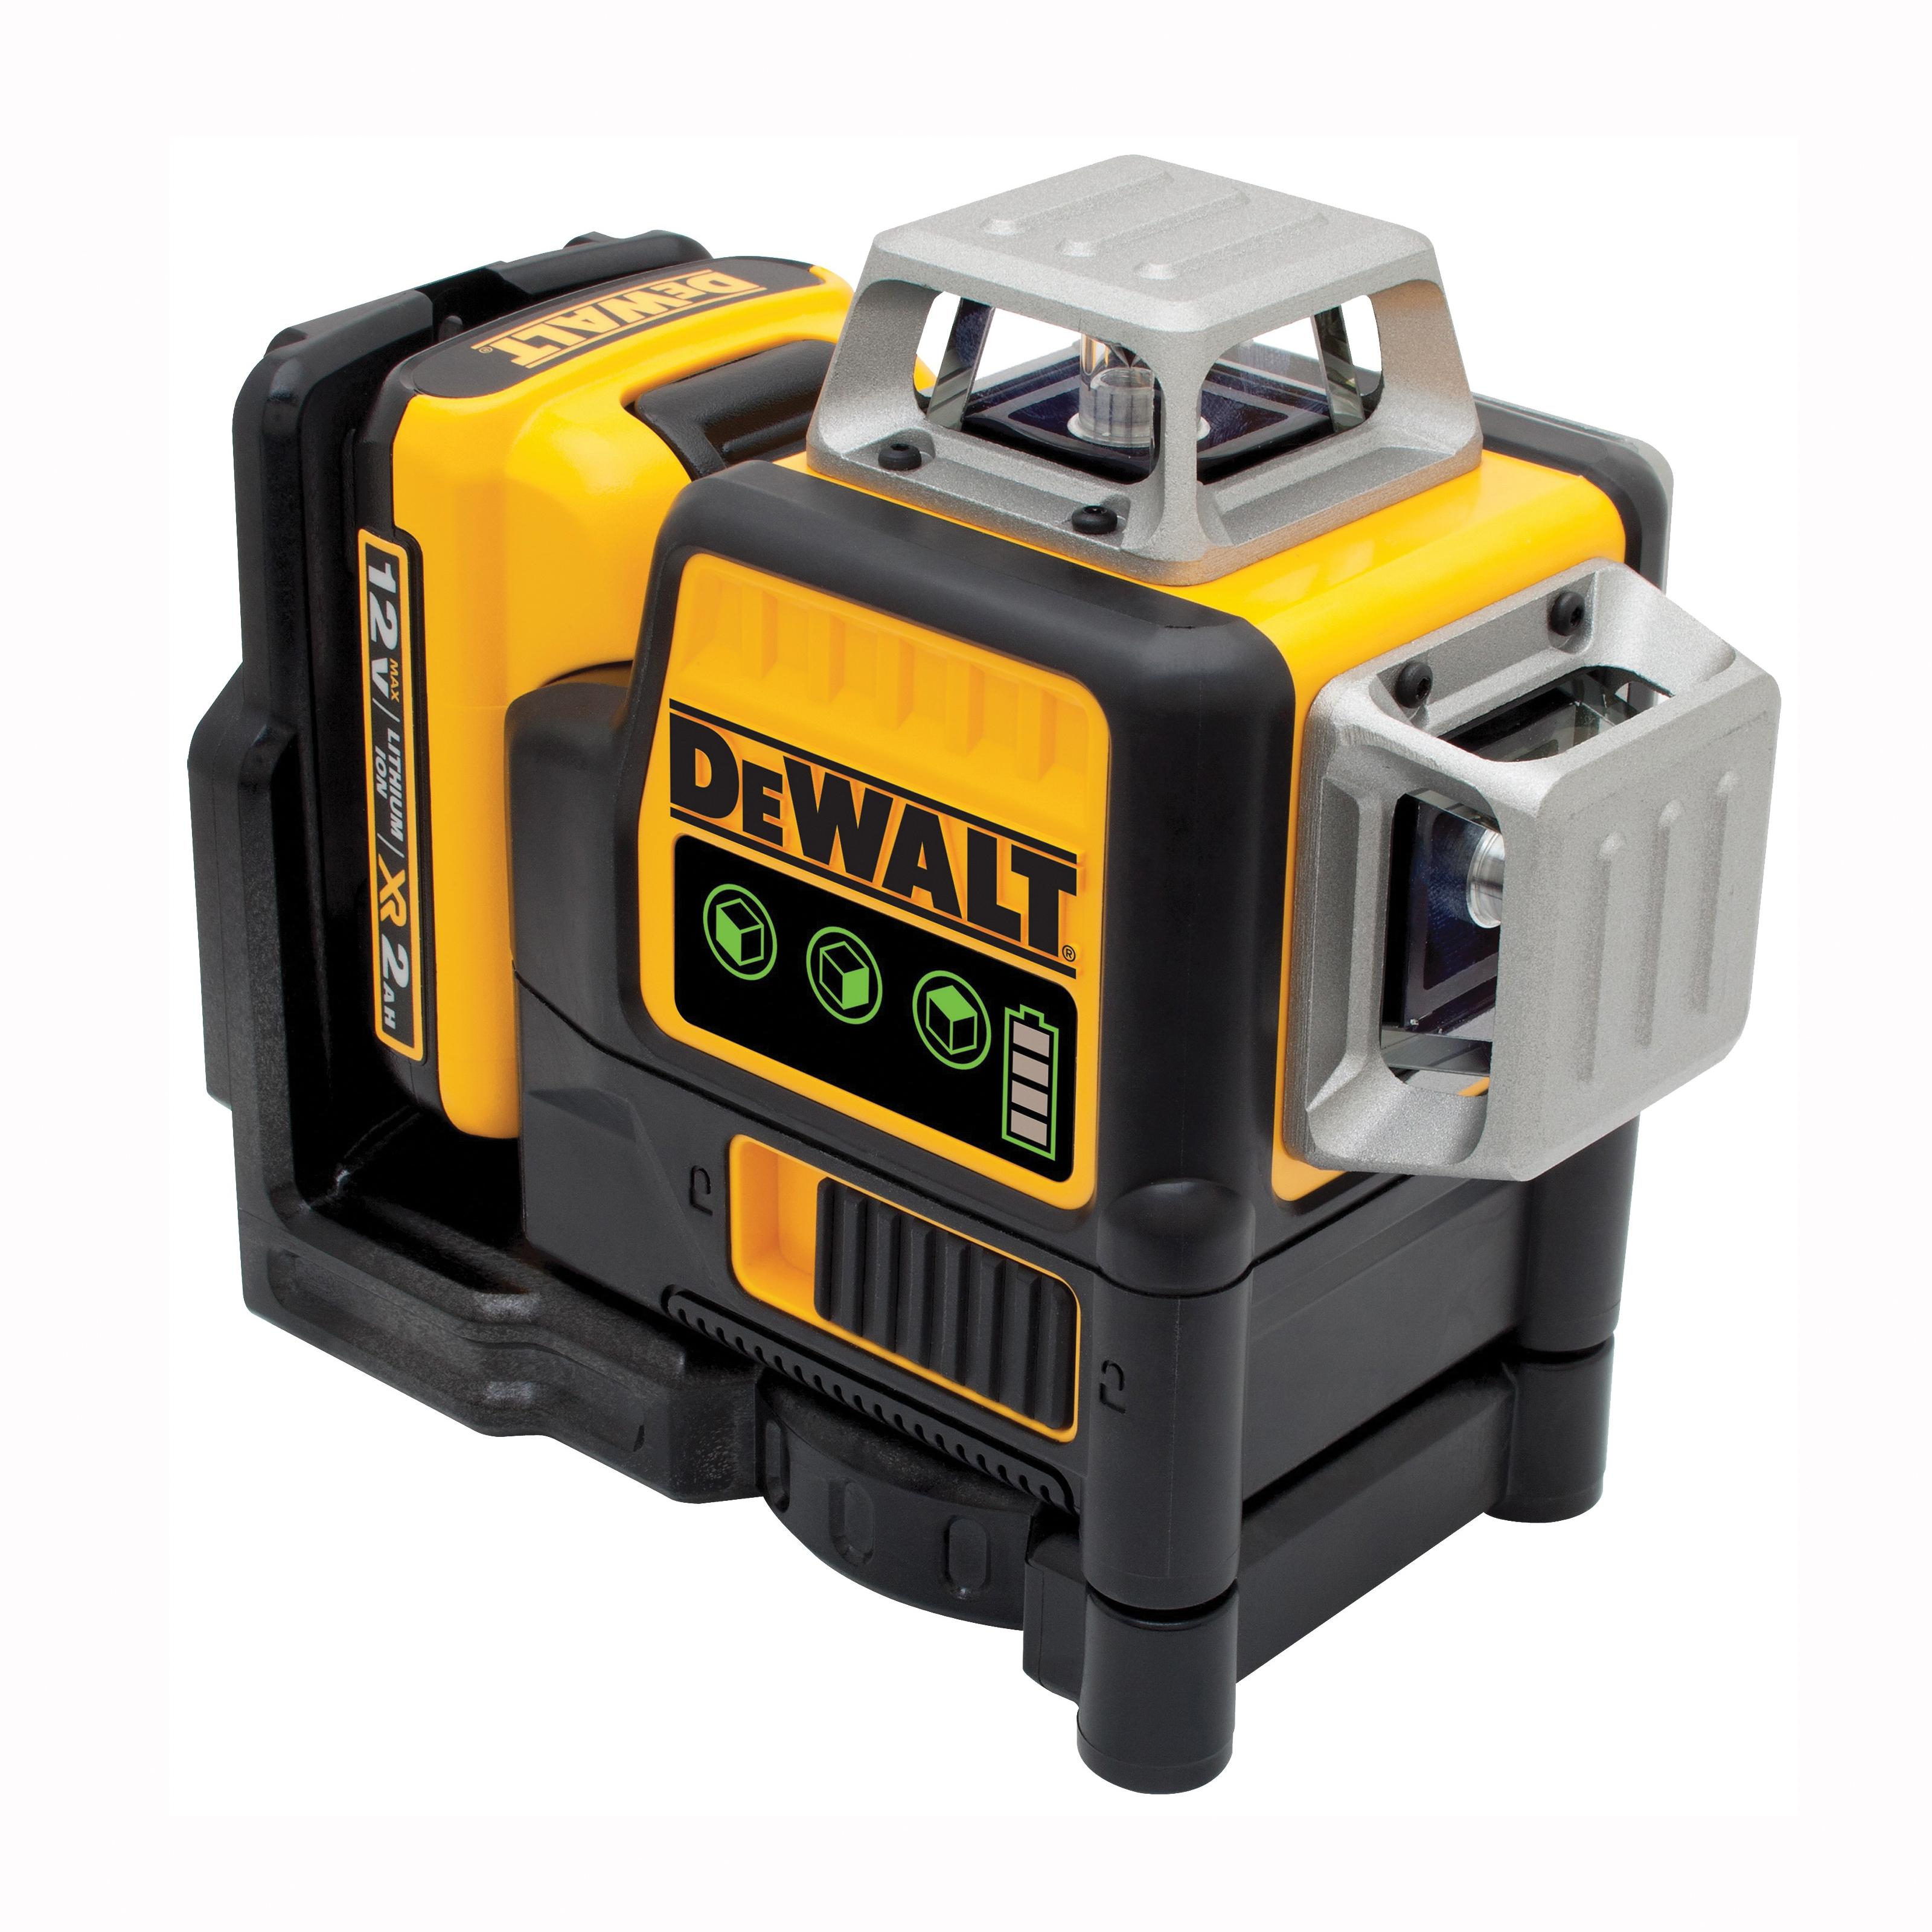 Picture of DeWALT DW089LG-QU Laser Level, 165 ft, +/-0.125 in Accuracy, Green Laser